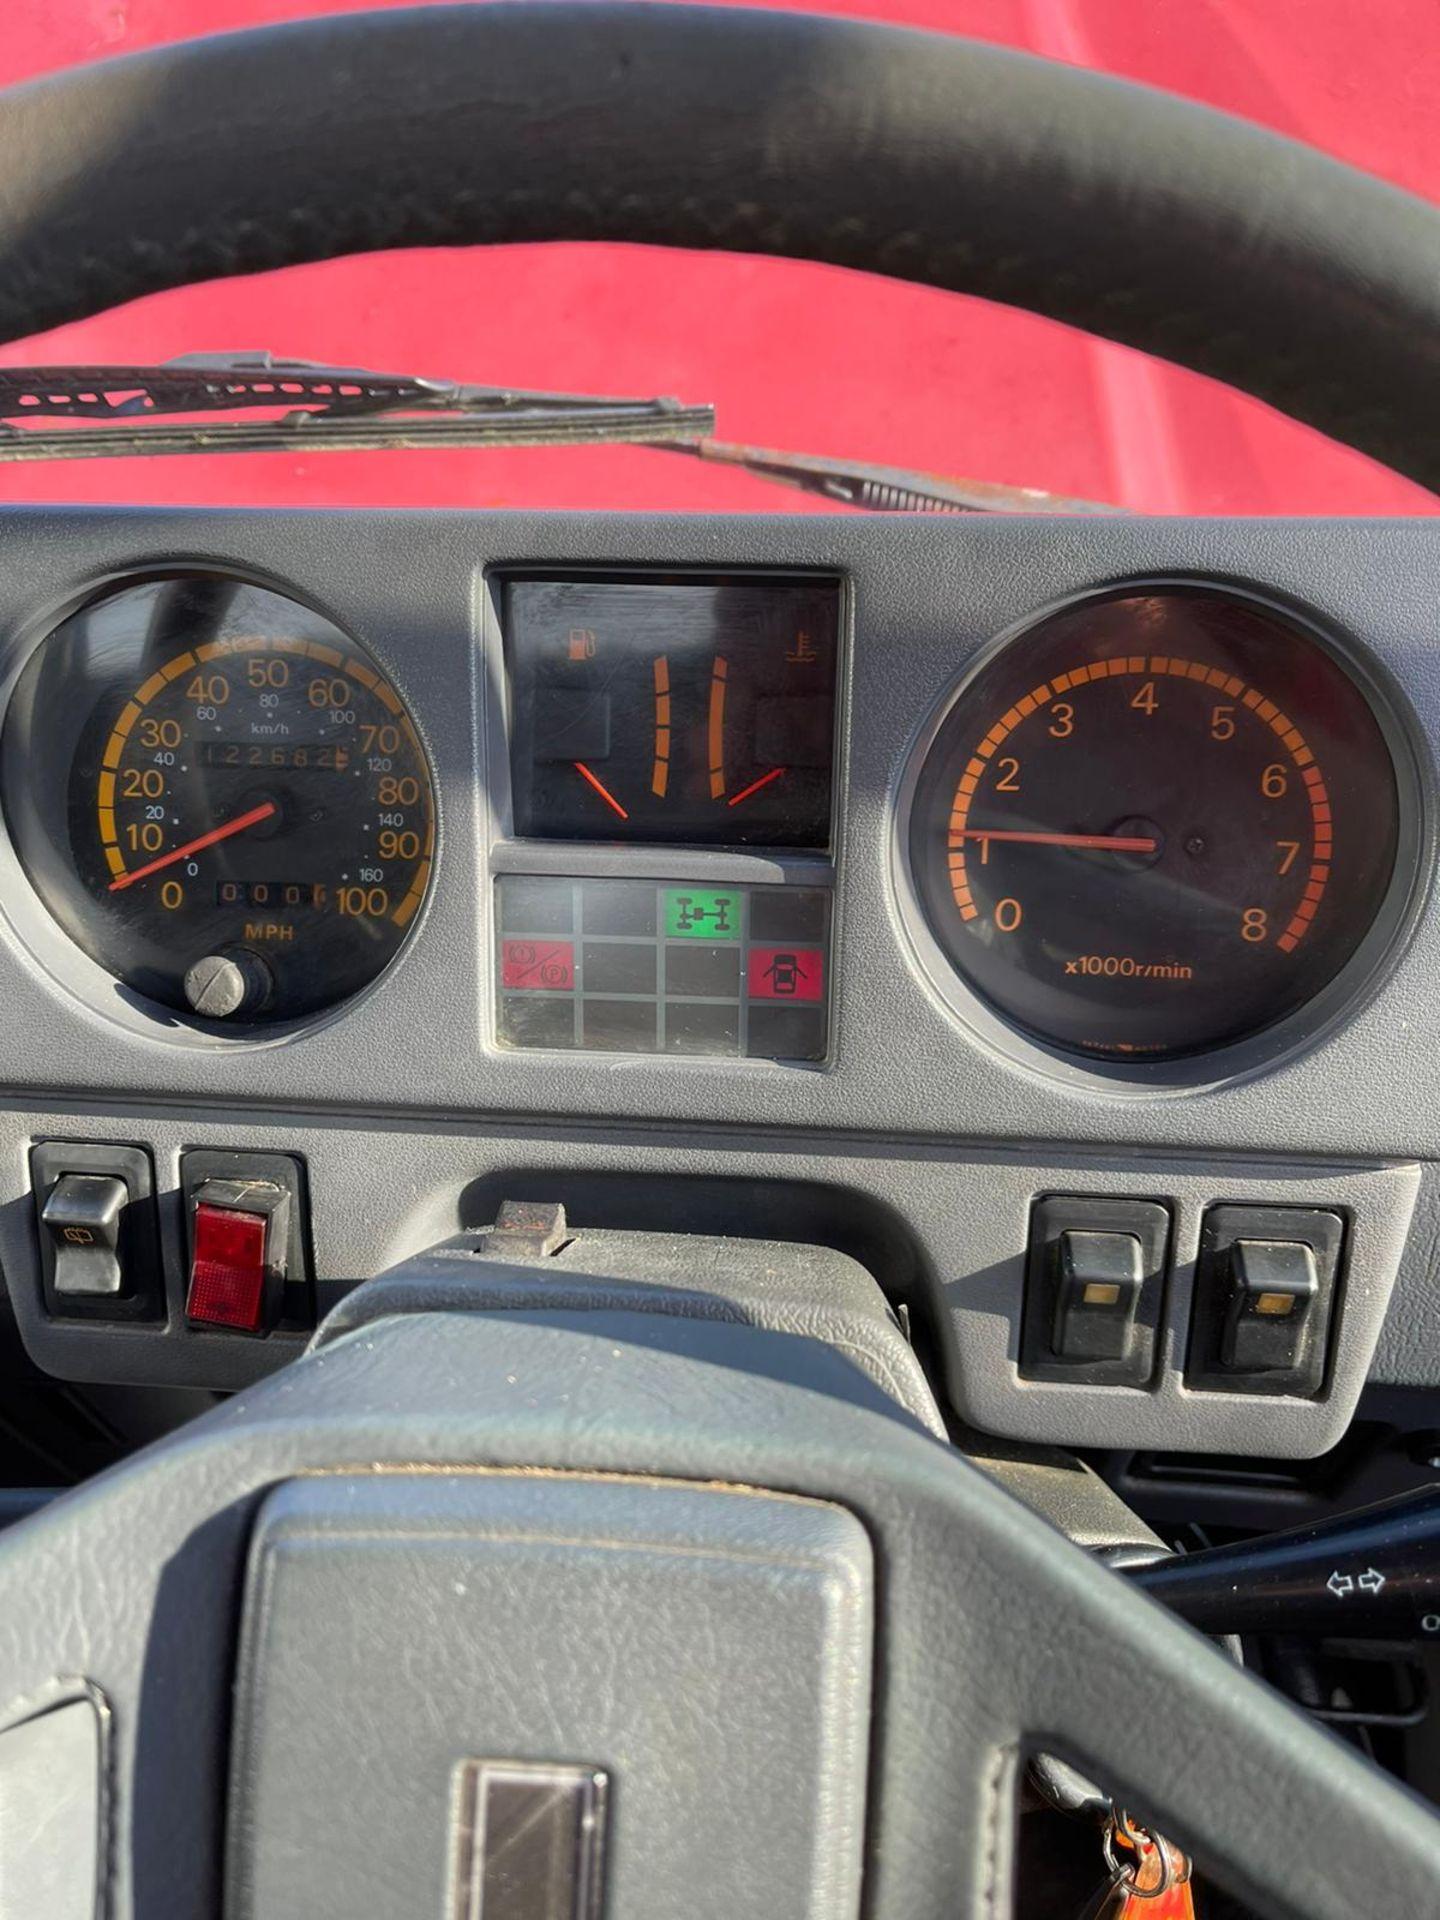 1987 MITSUBISHI SHOGUN SWB V6, BARN FIND, PETROL ENGINE, SHOWING 9 PERVIOUS KEEPERS *NO VAT* - Image 14 of 16